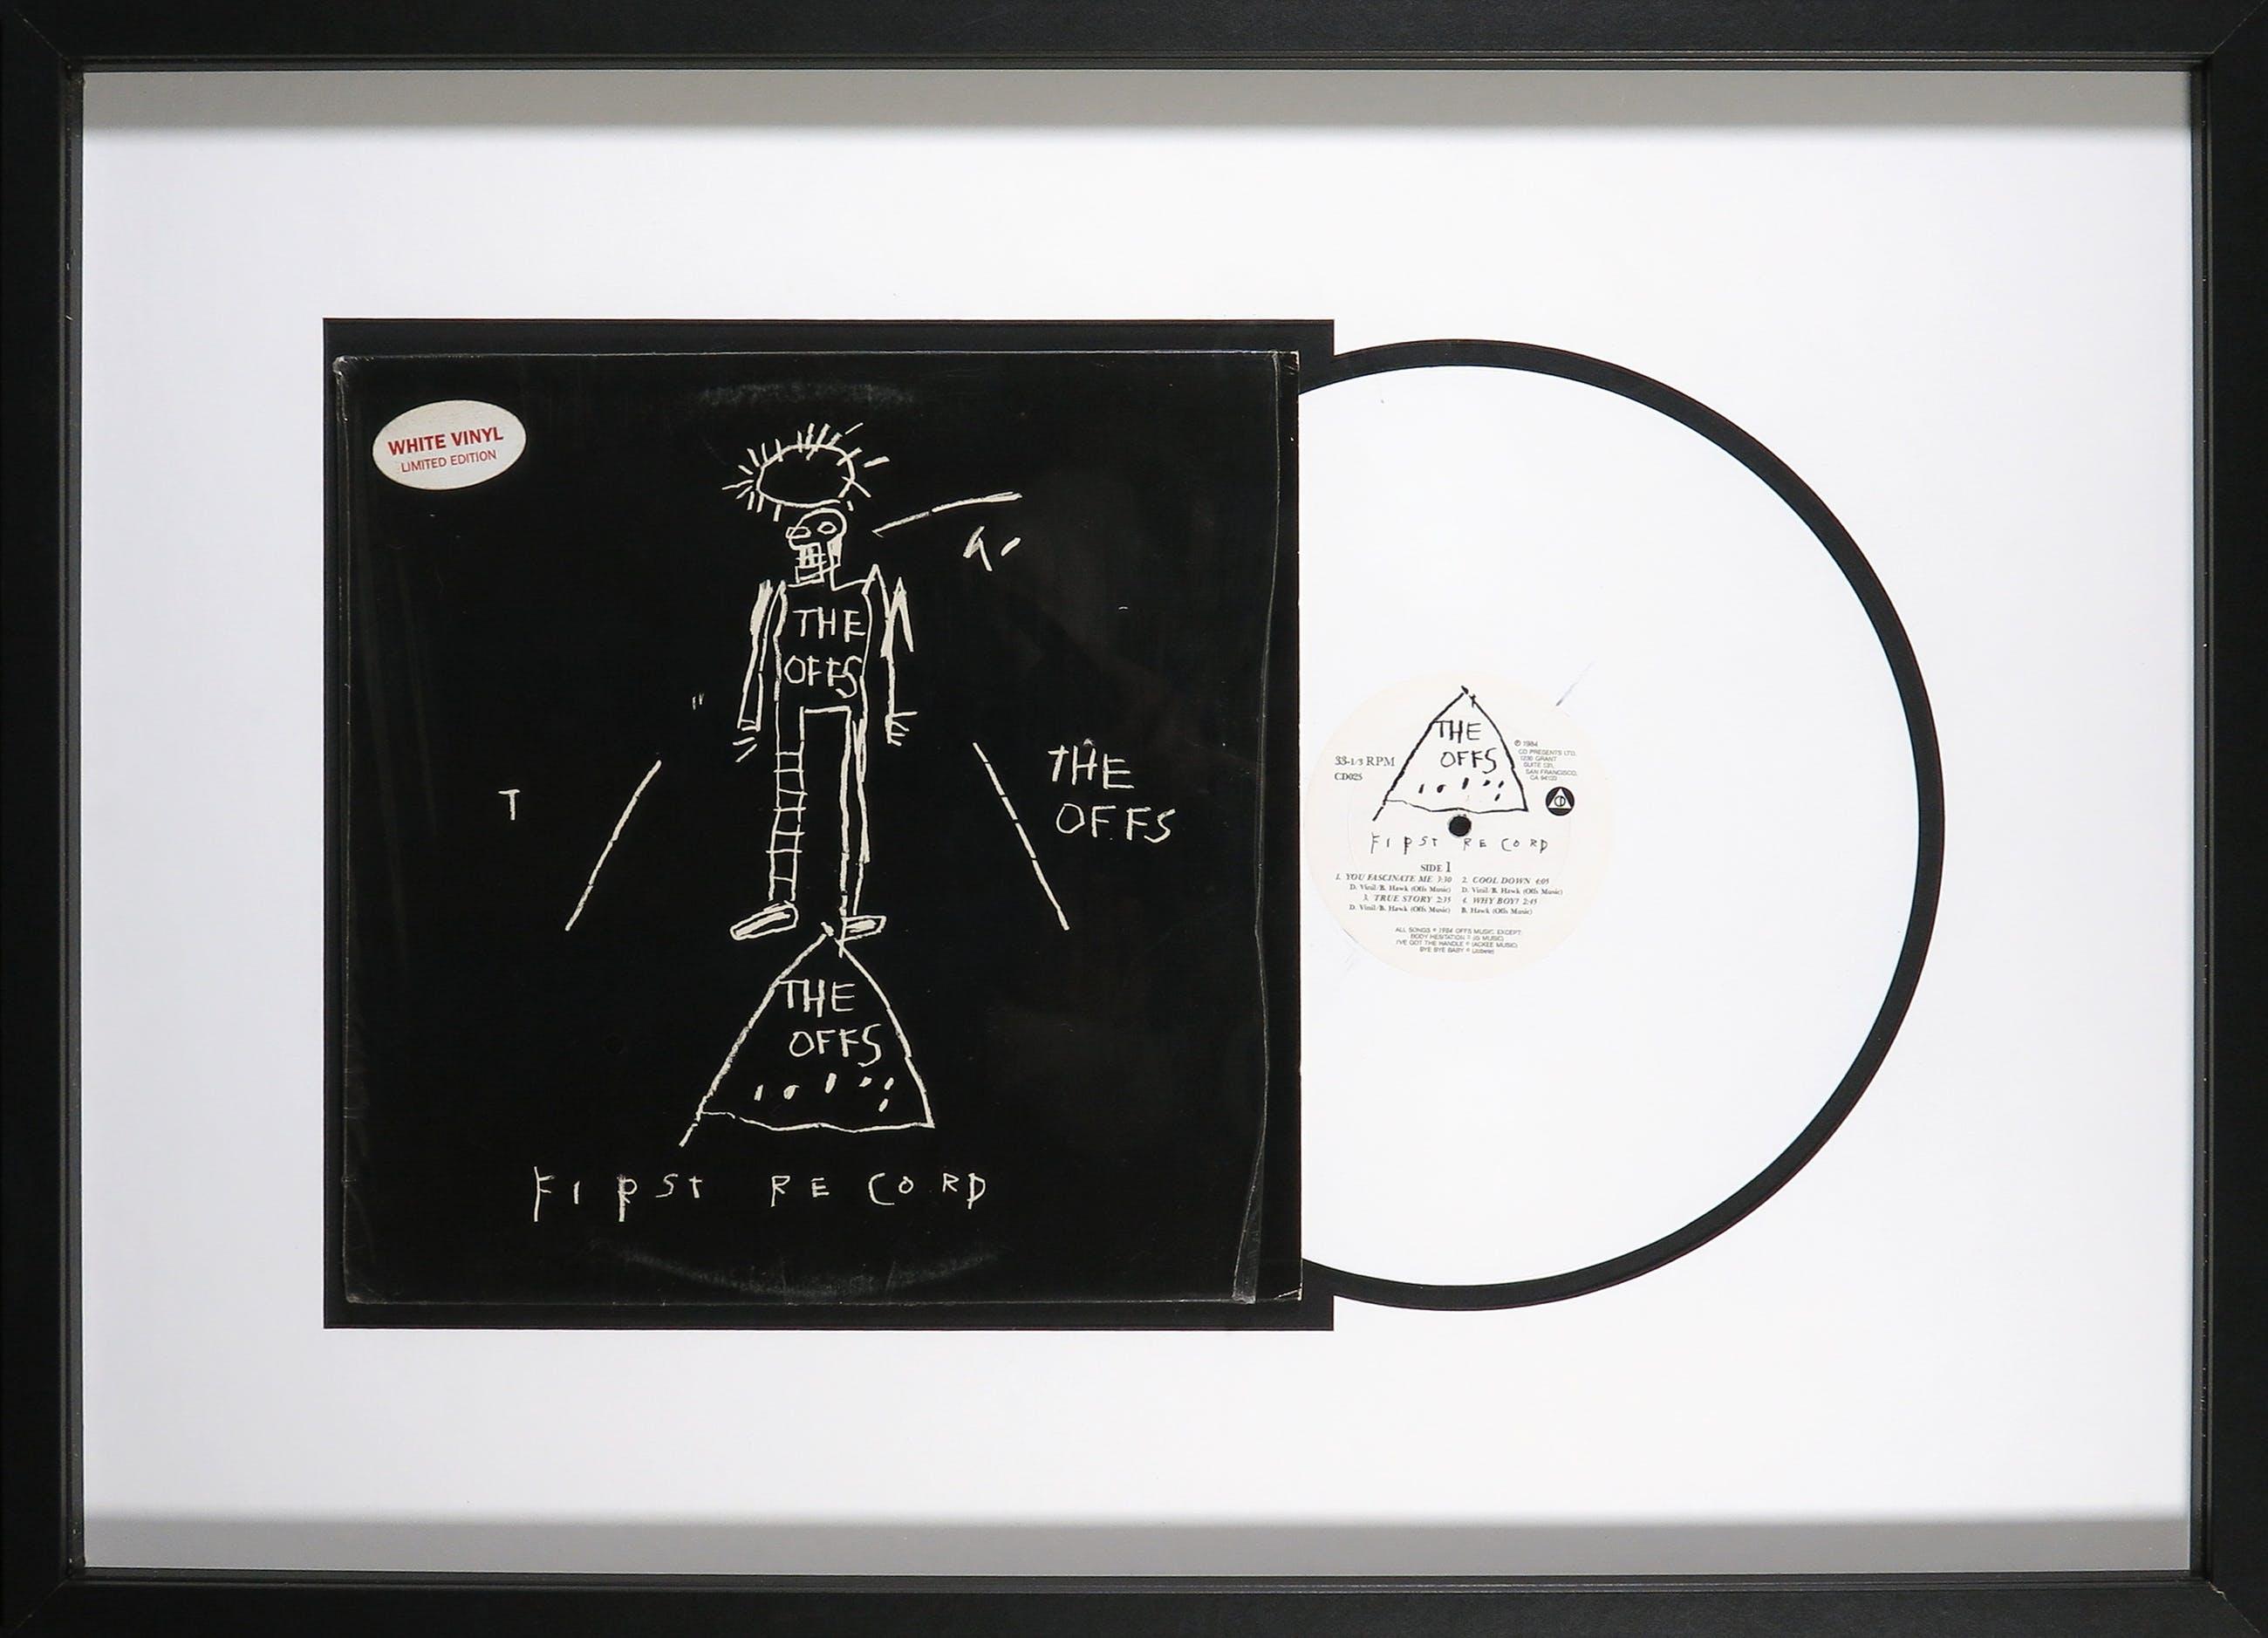 Jean-Michel Basquiat - The Offs: First Record - Originele White Vinyl pressing - Ingelijst kopen? Bied vanaf 1!